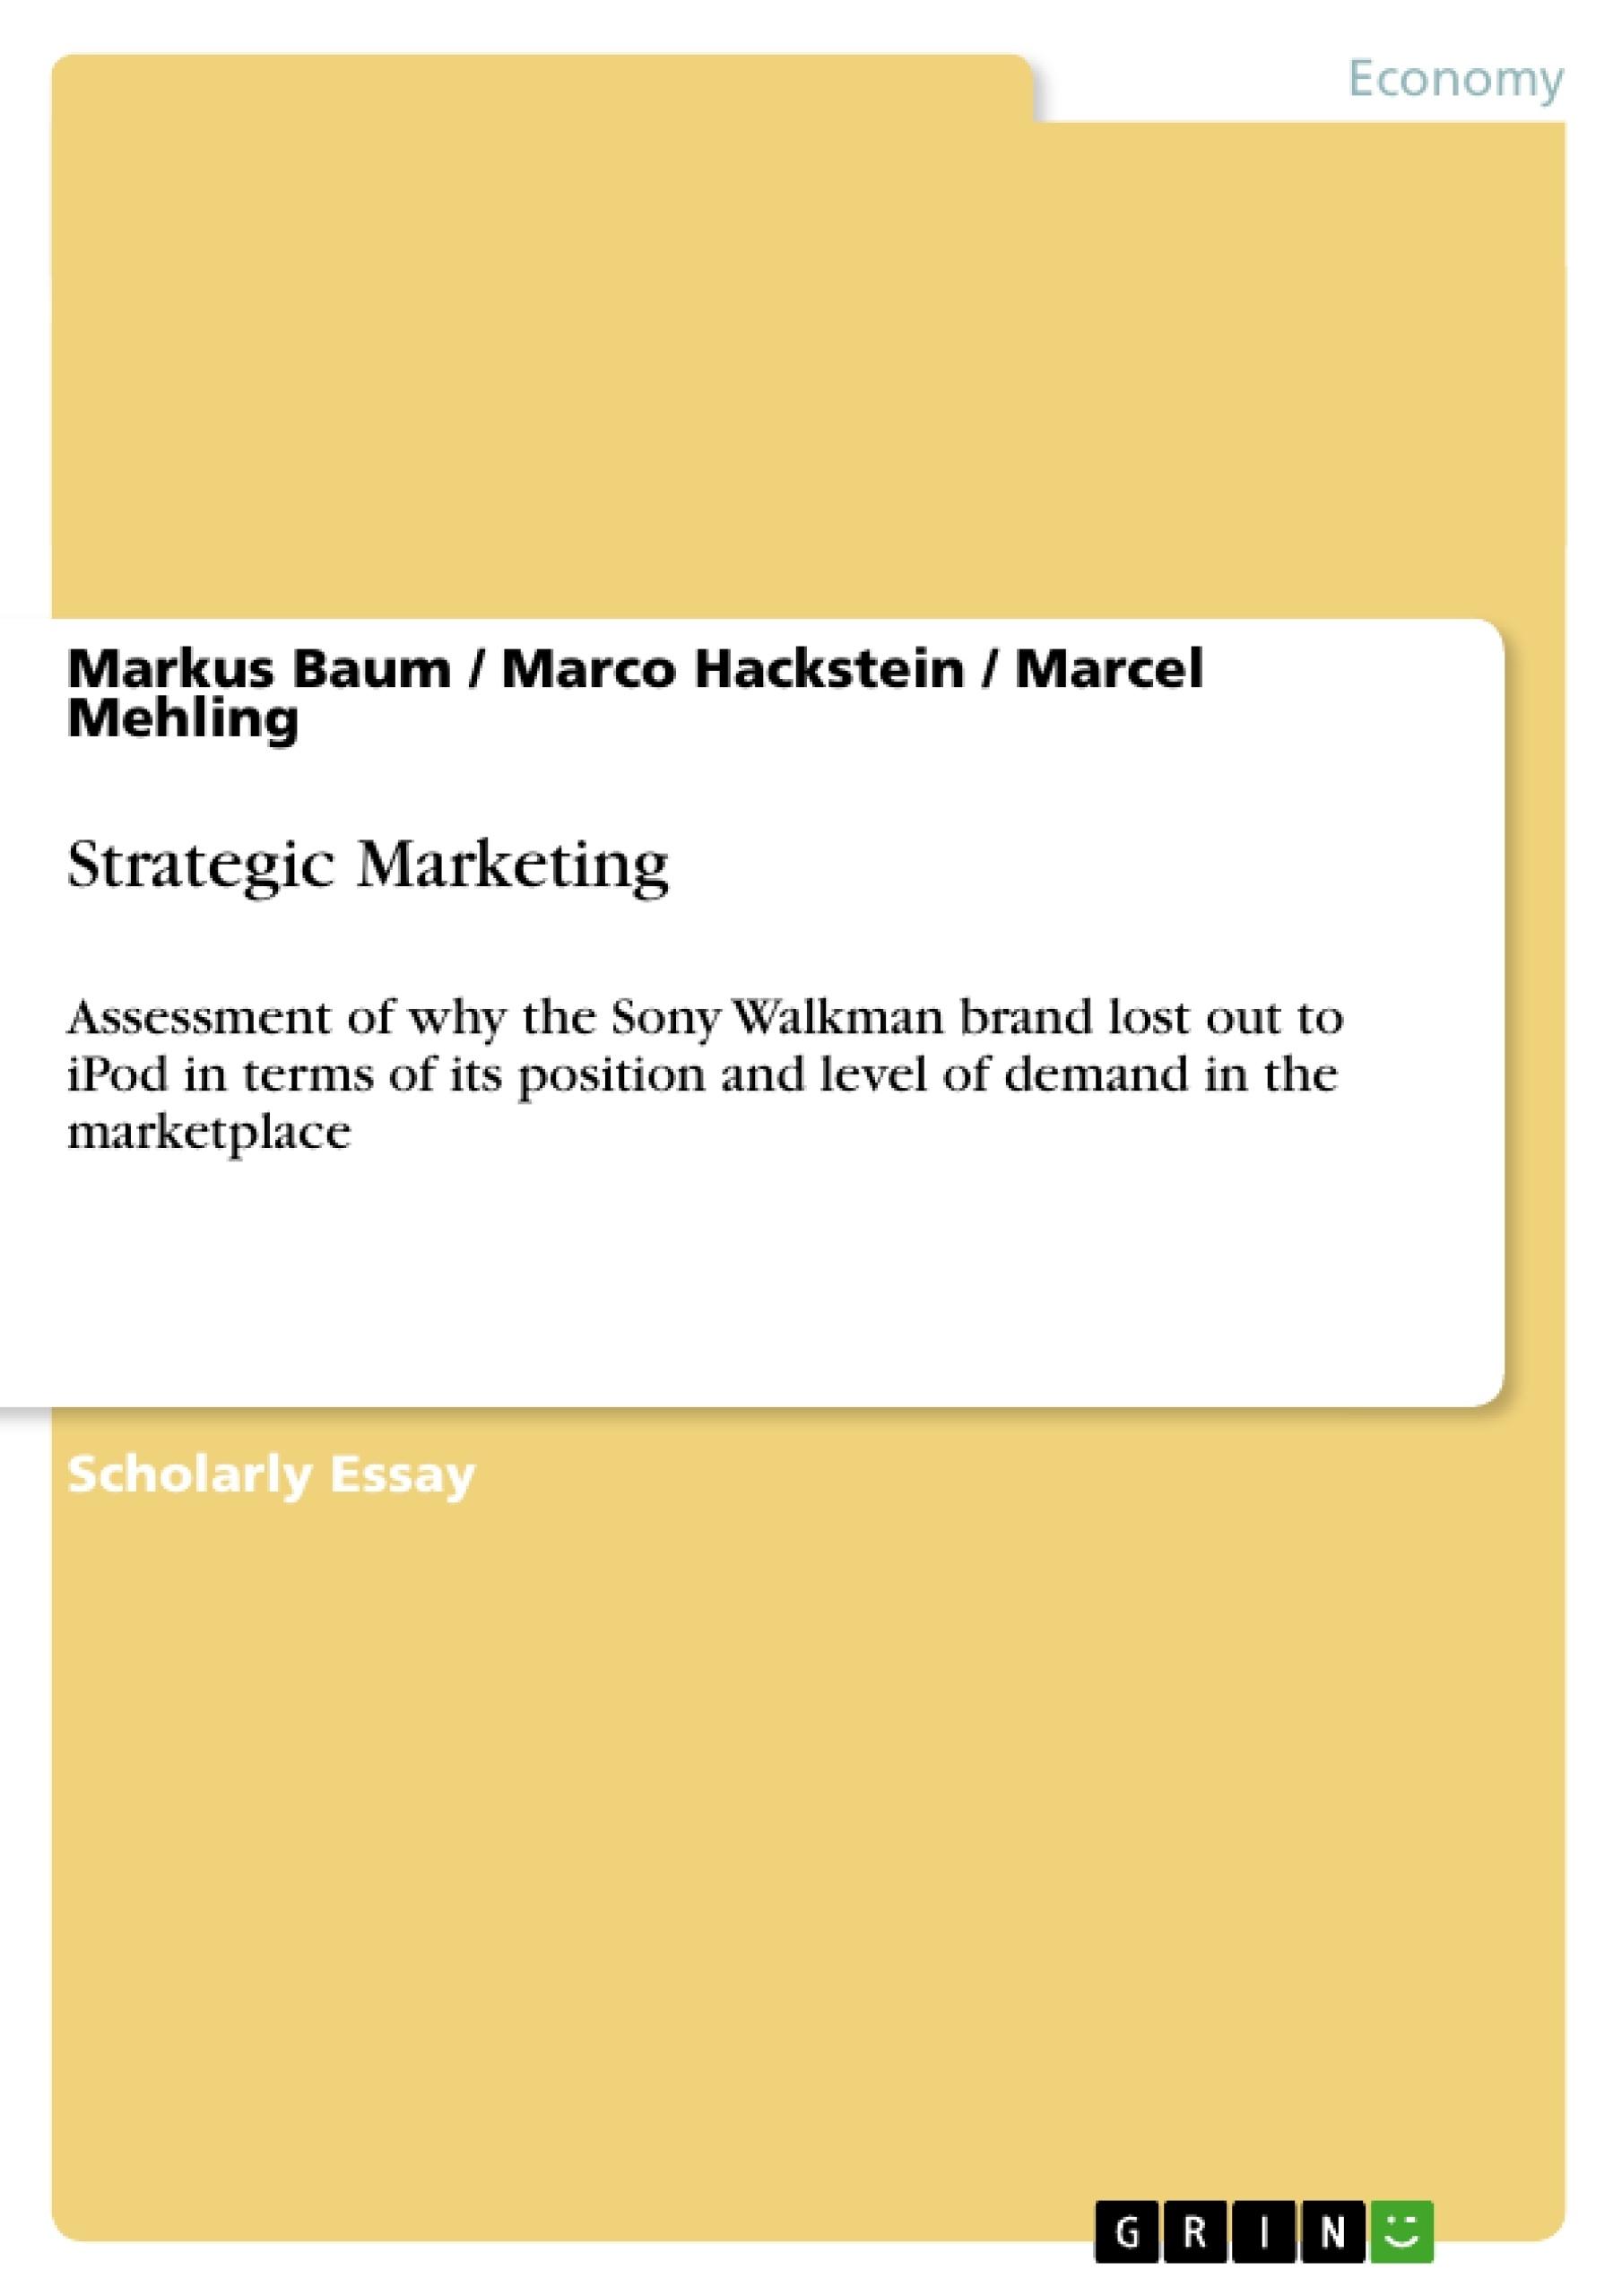 Title: Strategic Marketing